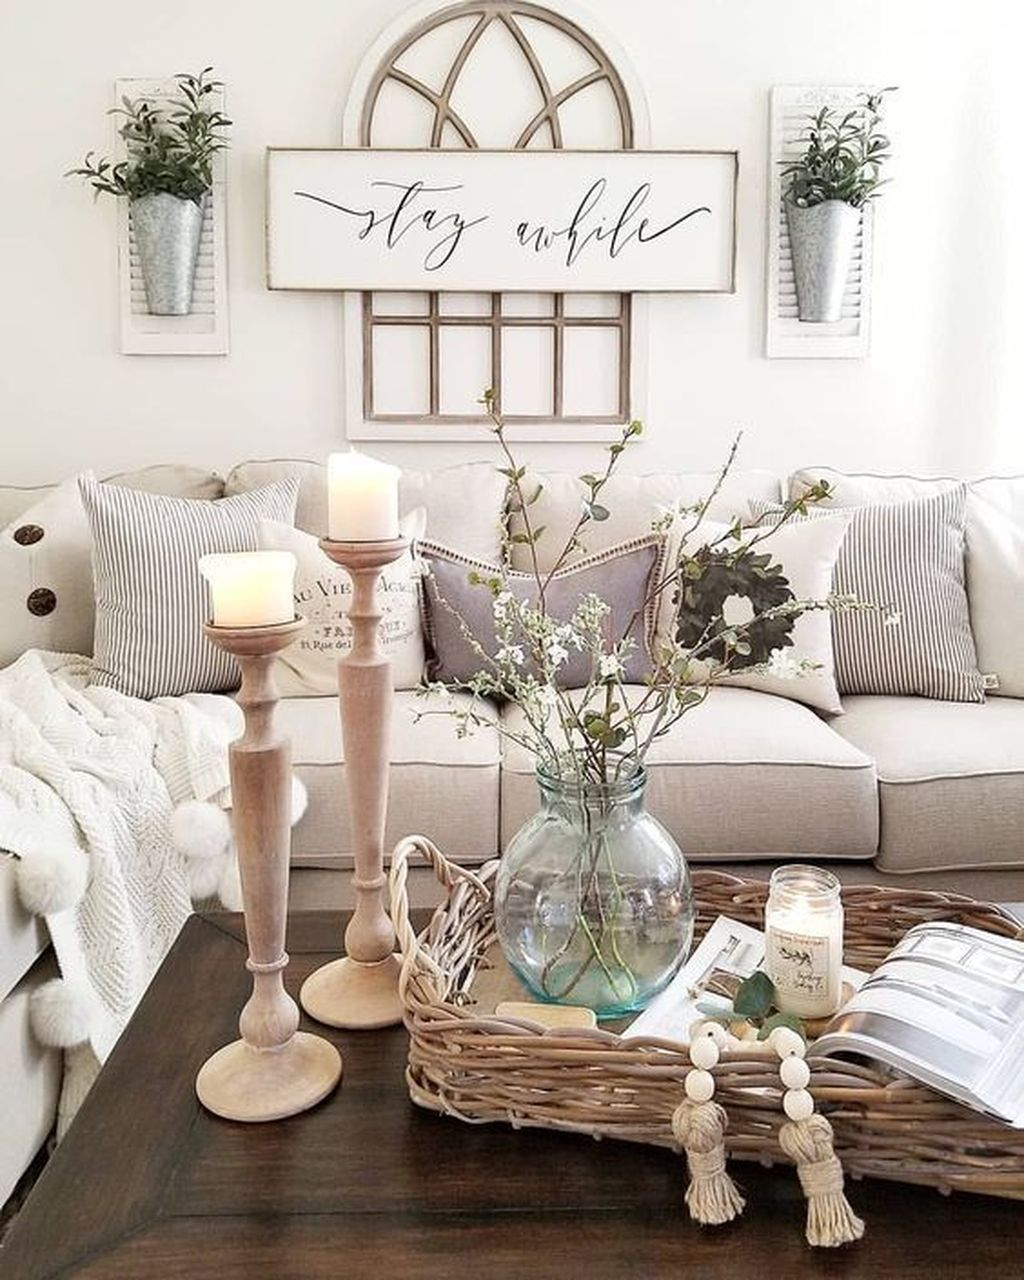 #decoration #farmhouse #living #ideas #cool #room48 Cool Farmhouse Living Room Decoration Ideas